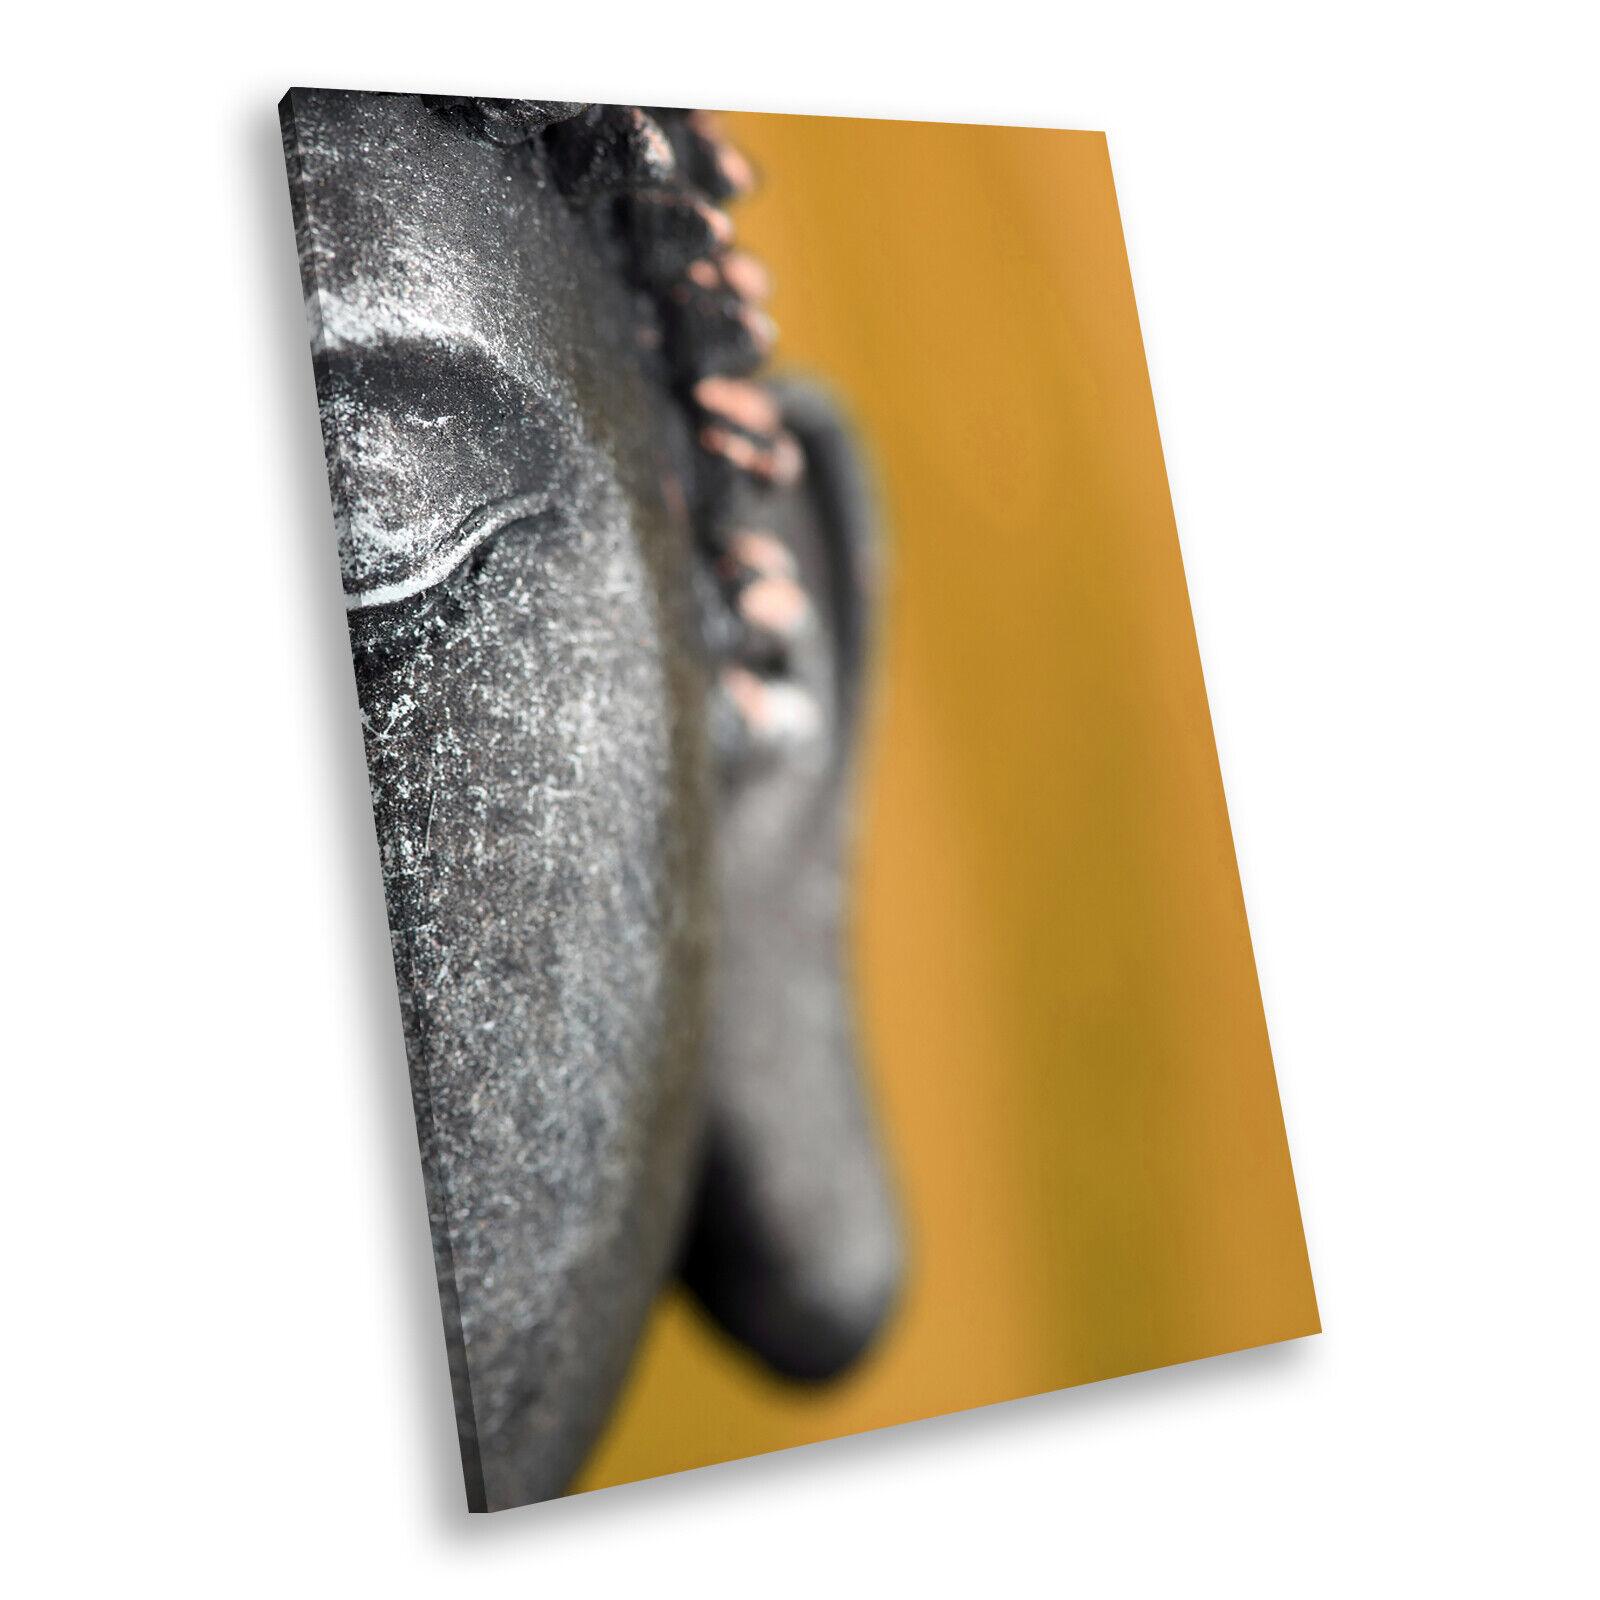 grau Gelb Buddha Retro Portrait Scenic Canvas Wall Art Large Picture Prints